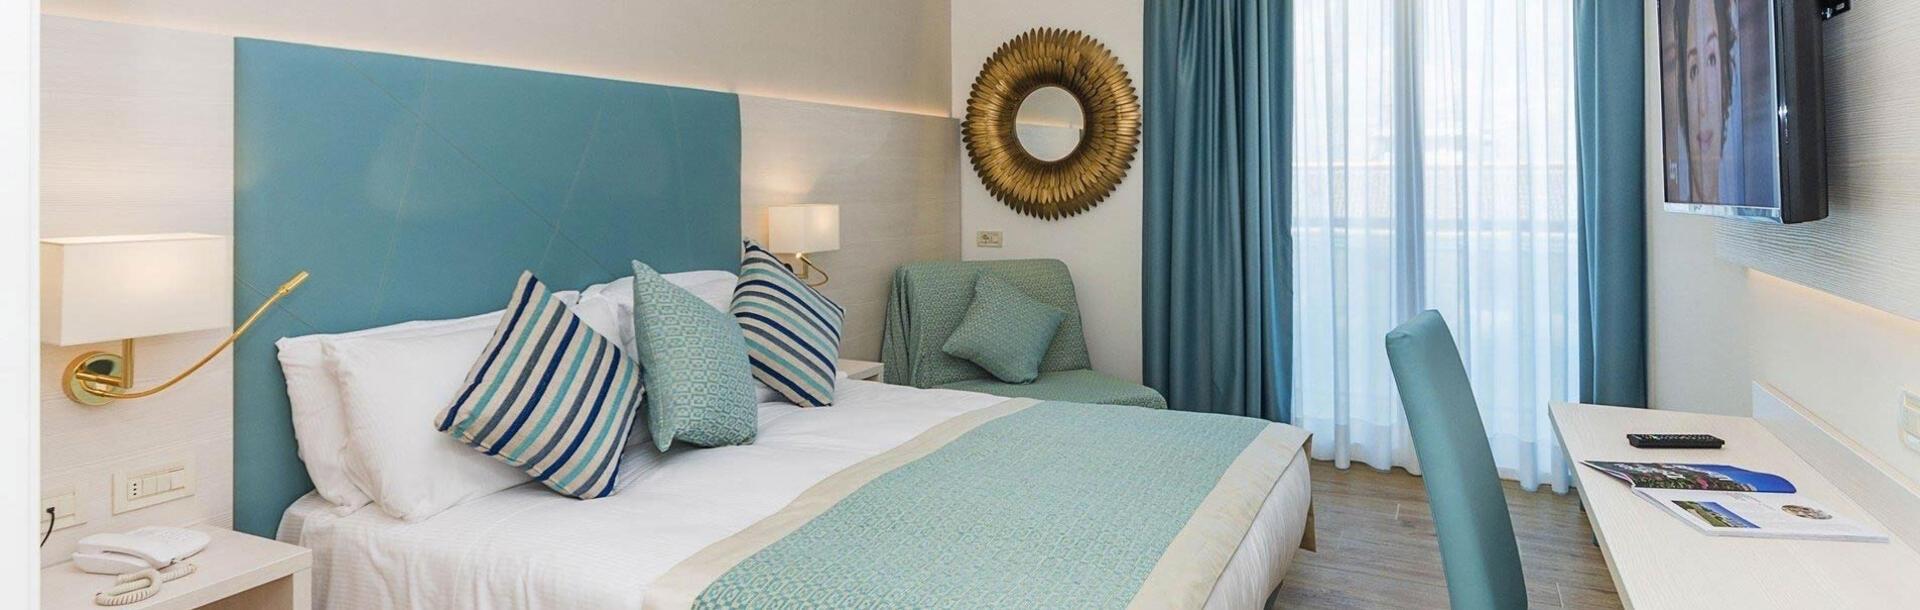 hotel-montecarlo en hotel-with-suites-in-bibione 013